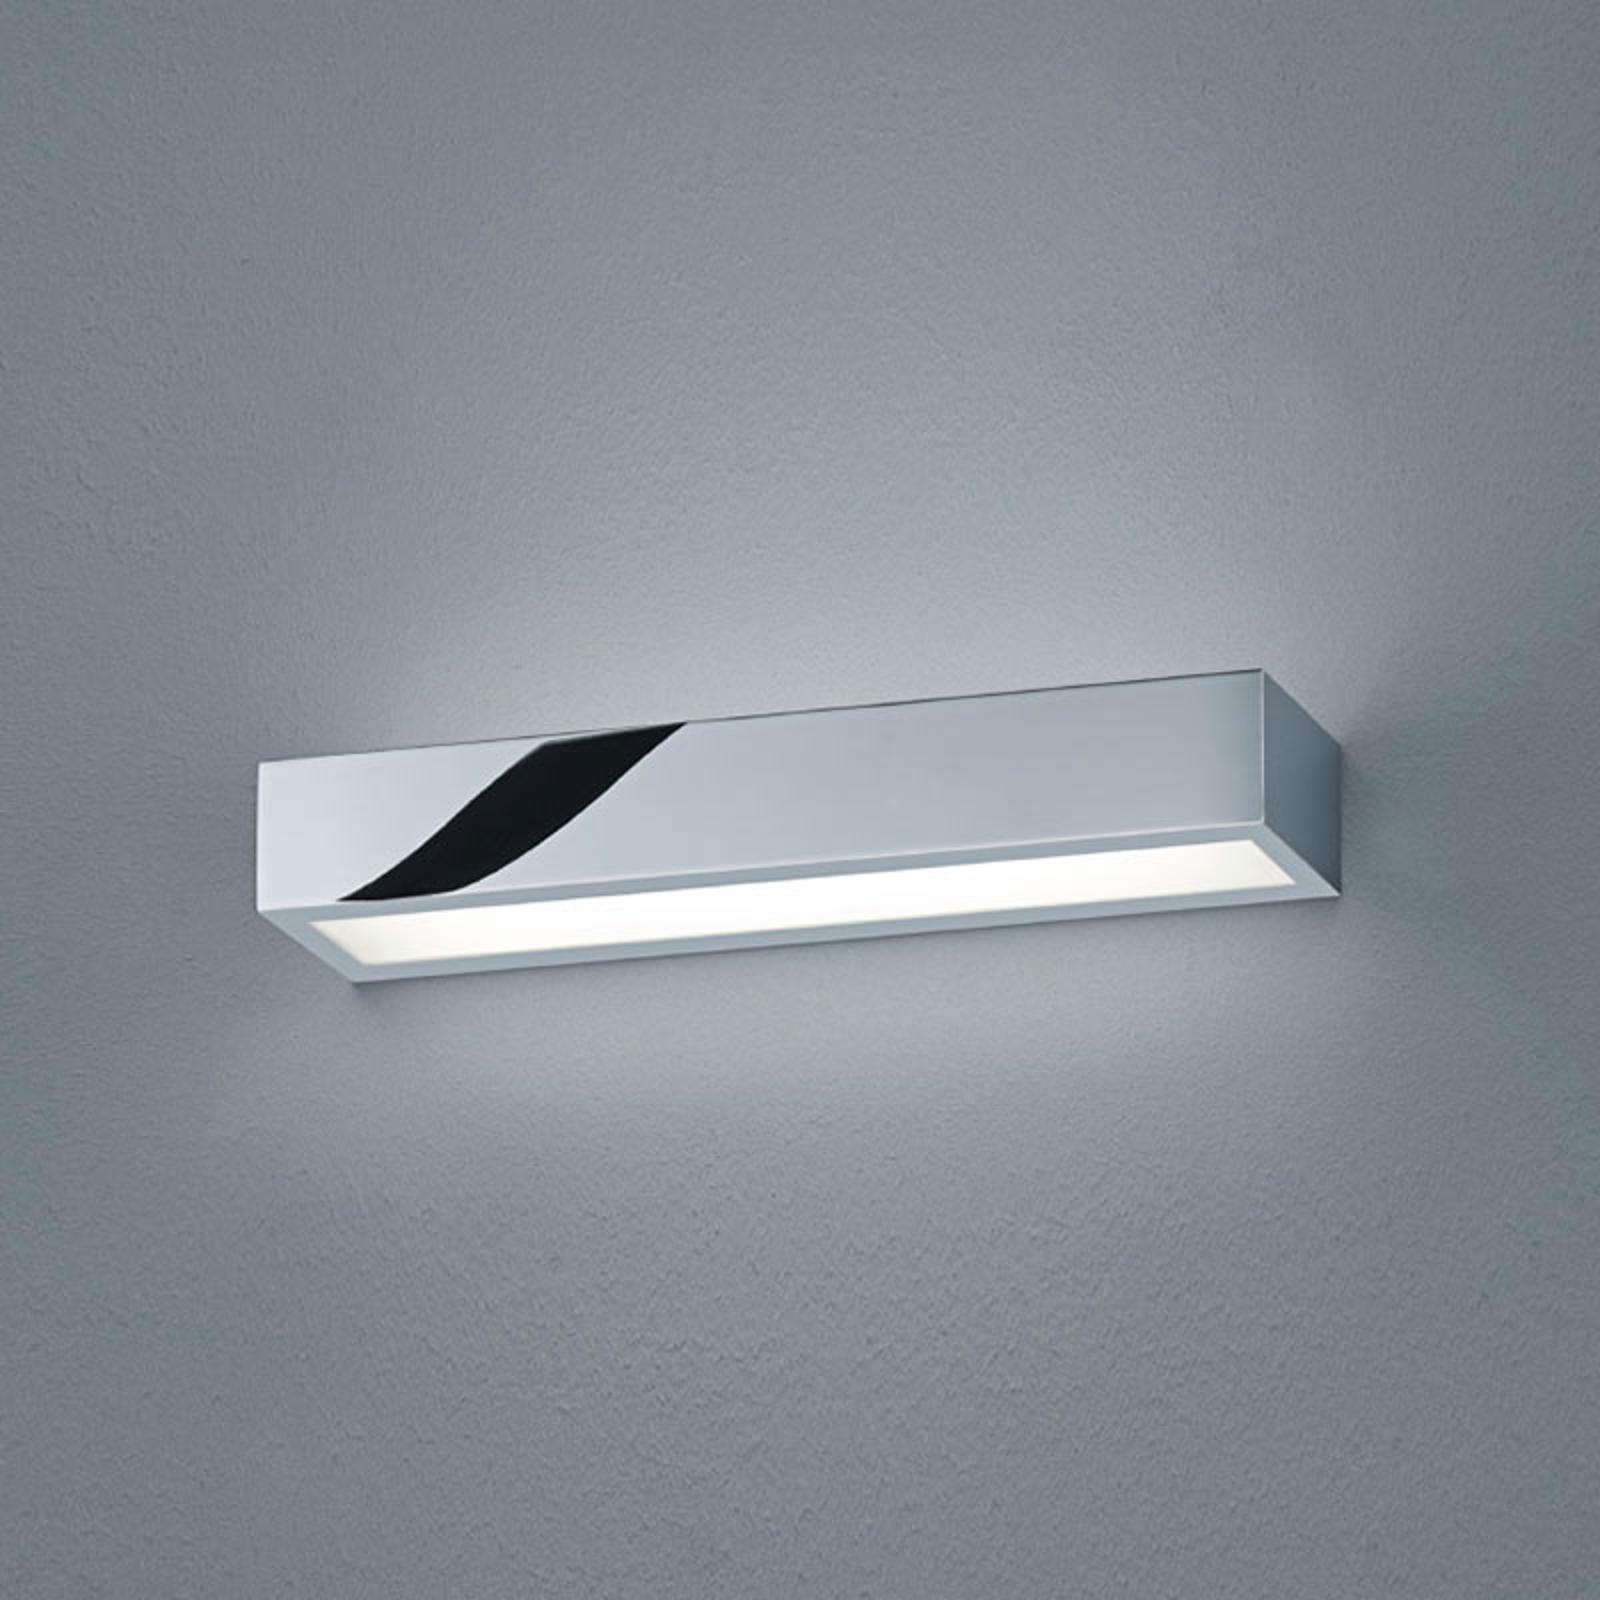 Helestra Theia LED-spejllampe, forkromet, 30 cm